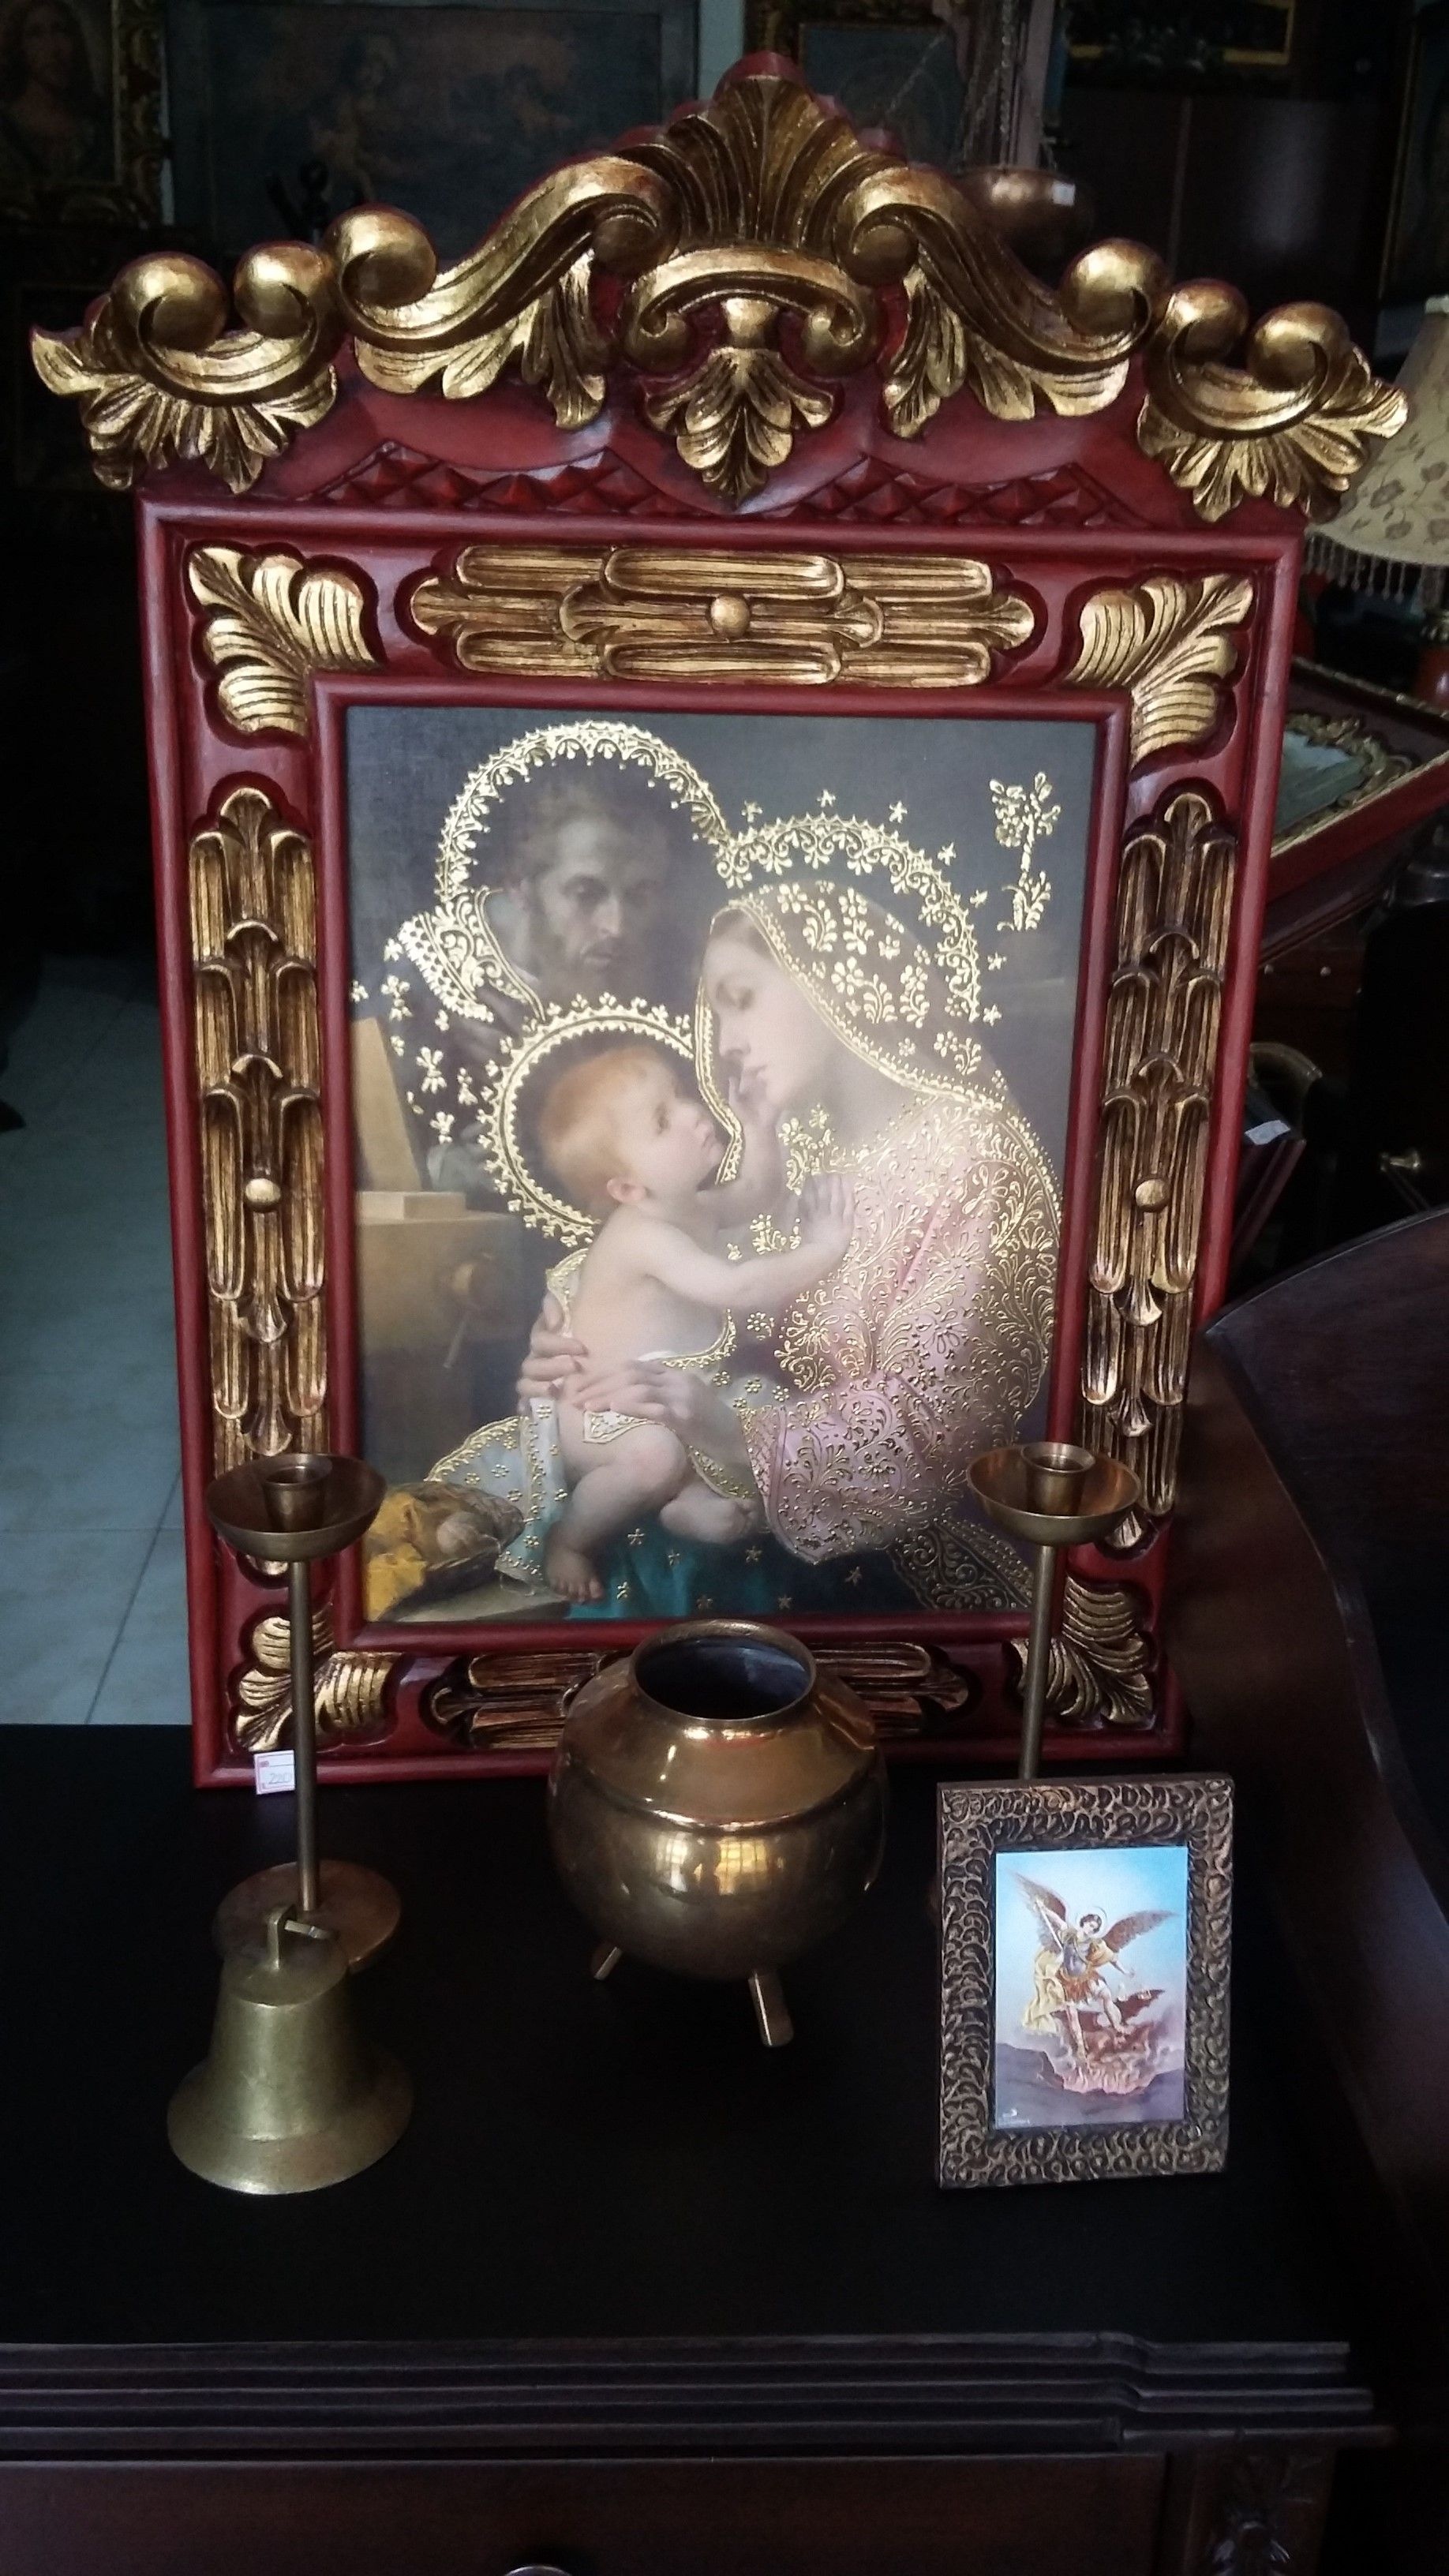 Lámina iluminada. Sagrada familia. marco talla en madera | Cuadros ...